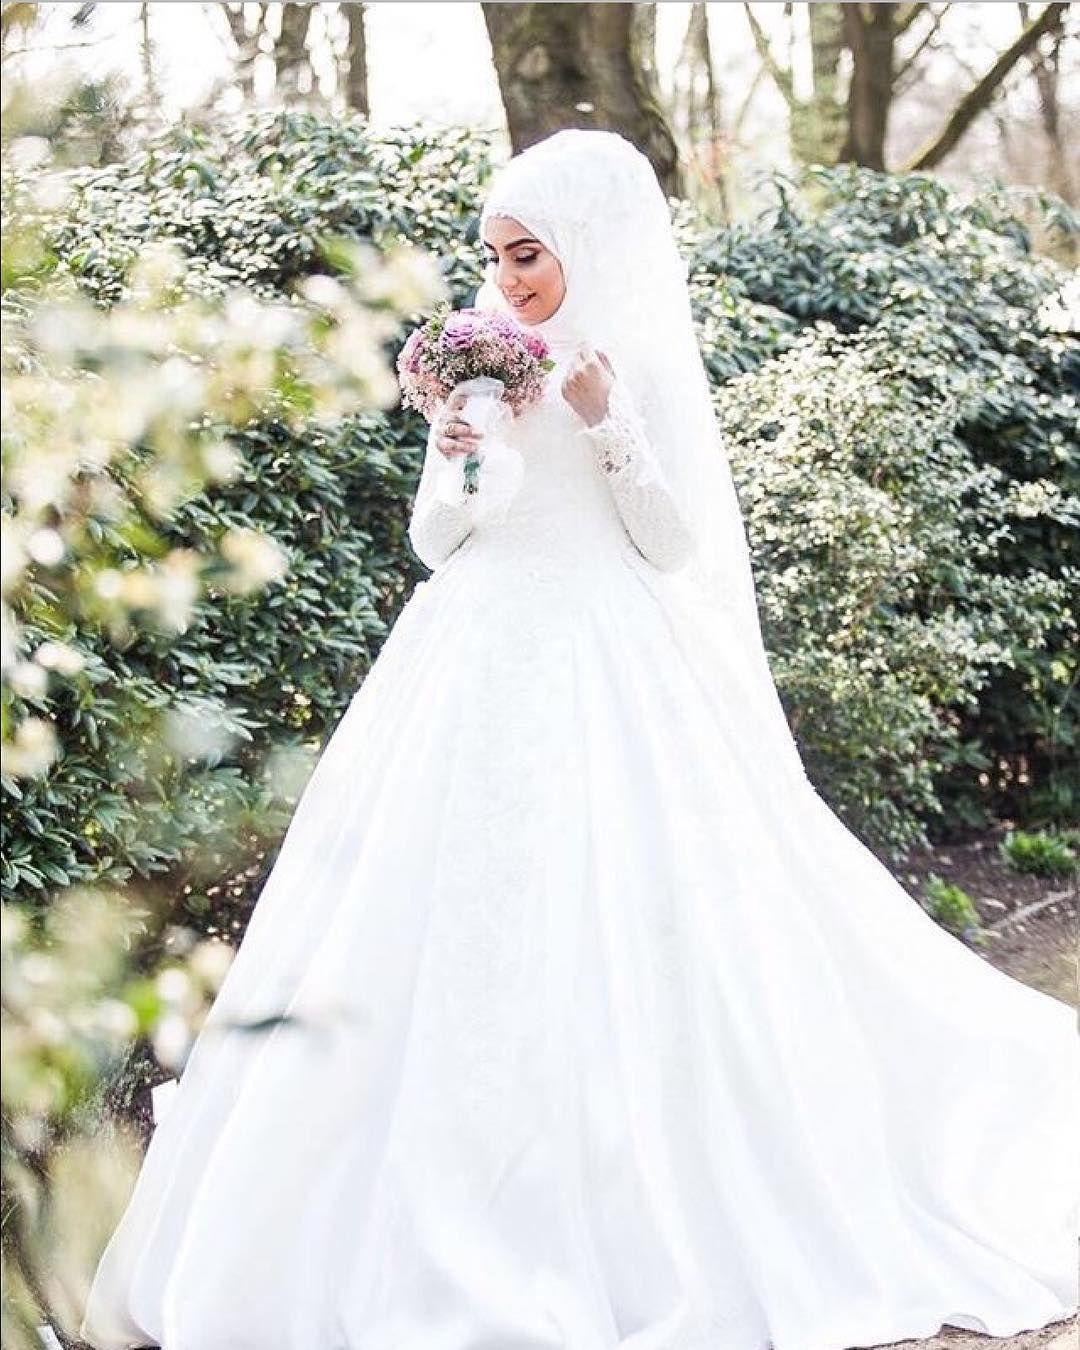 11 Likes, 11 Comments - Hijabi Bride Fashion 🎀🎀 (@hijabiwedding